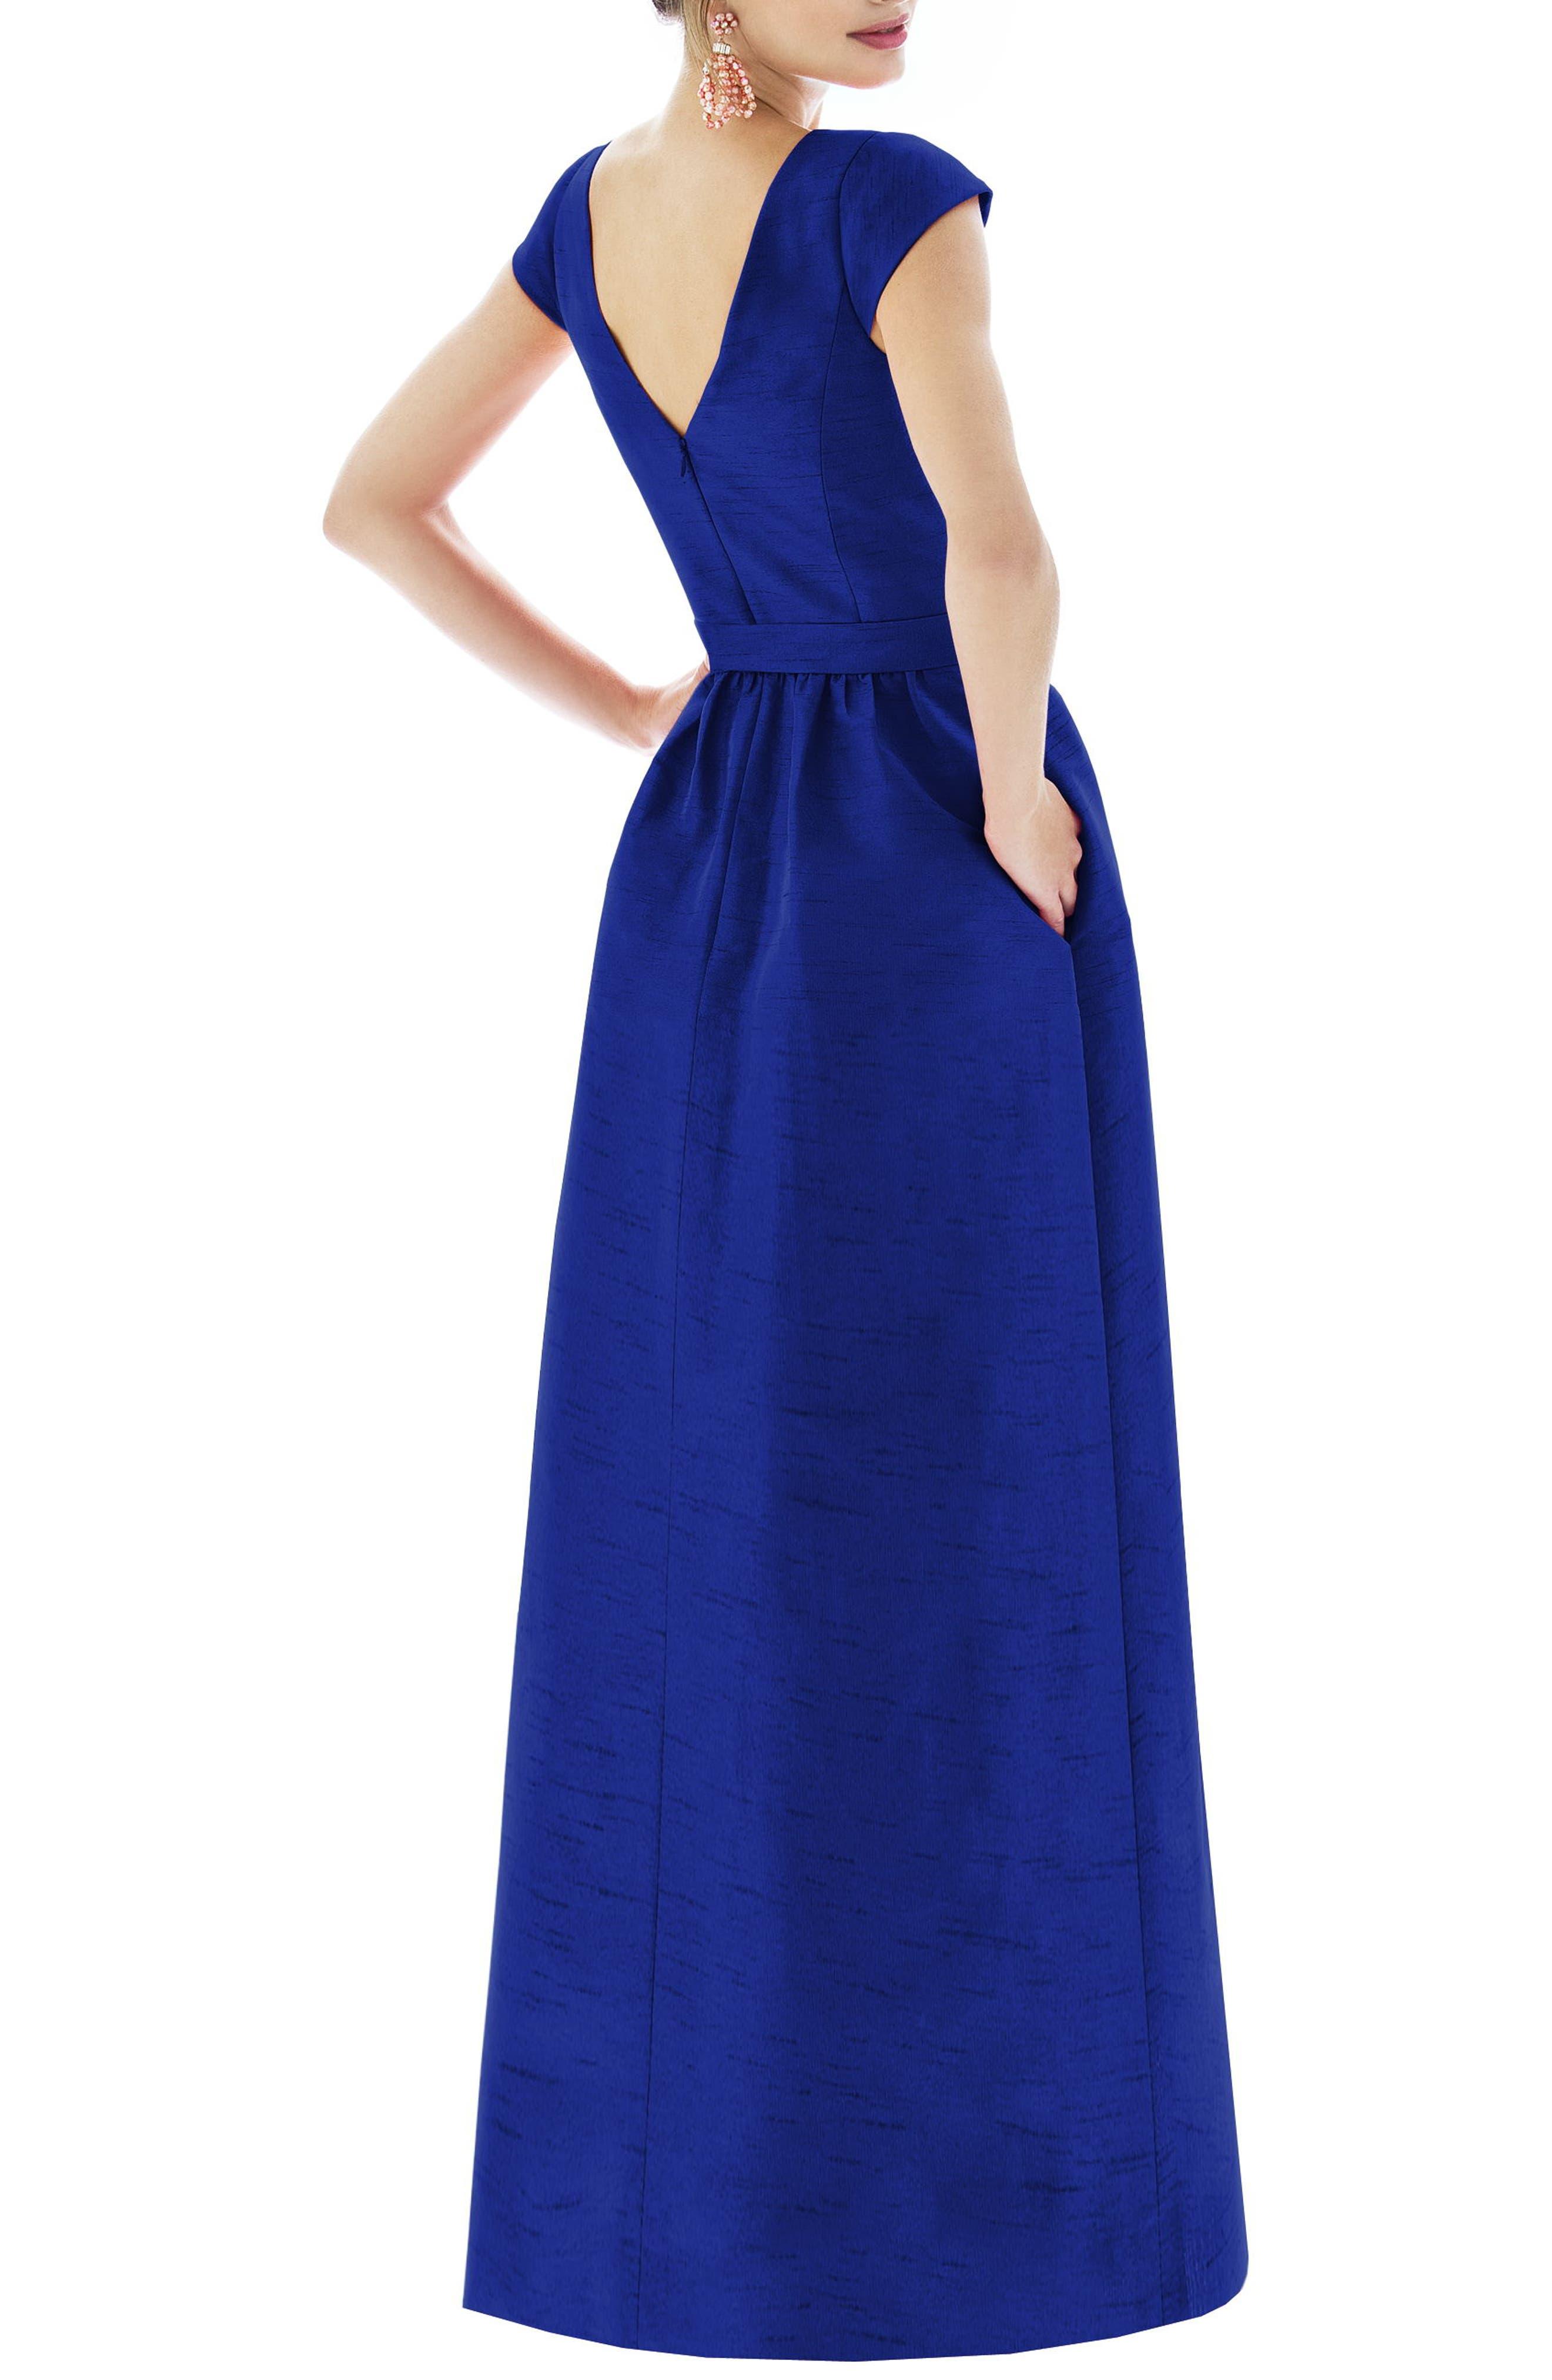 ALFRED SUNG, Cap Sleeve Dupioni Full Length Dress, Alternate thumbnail 2, color, ROYAL